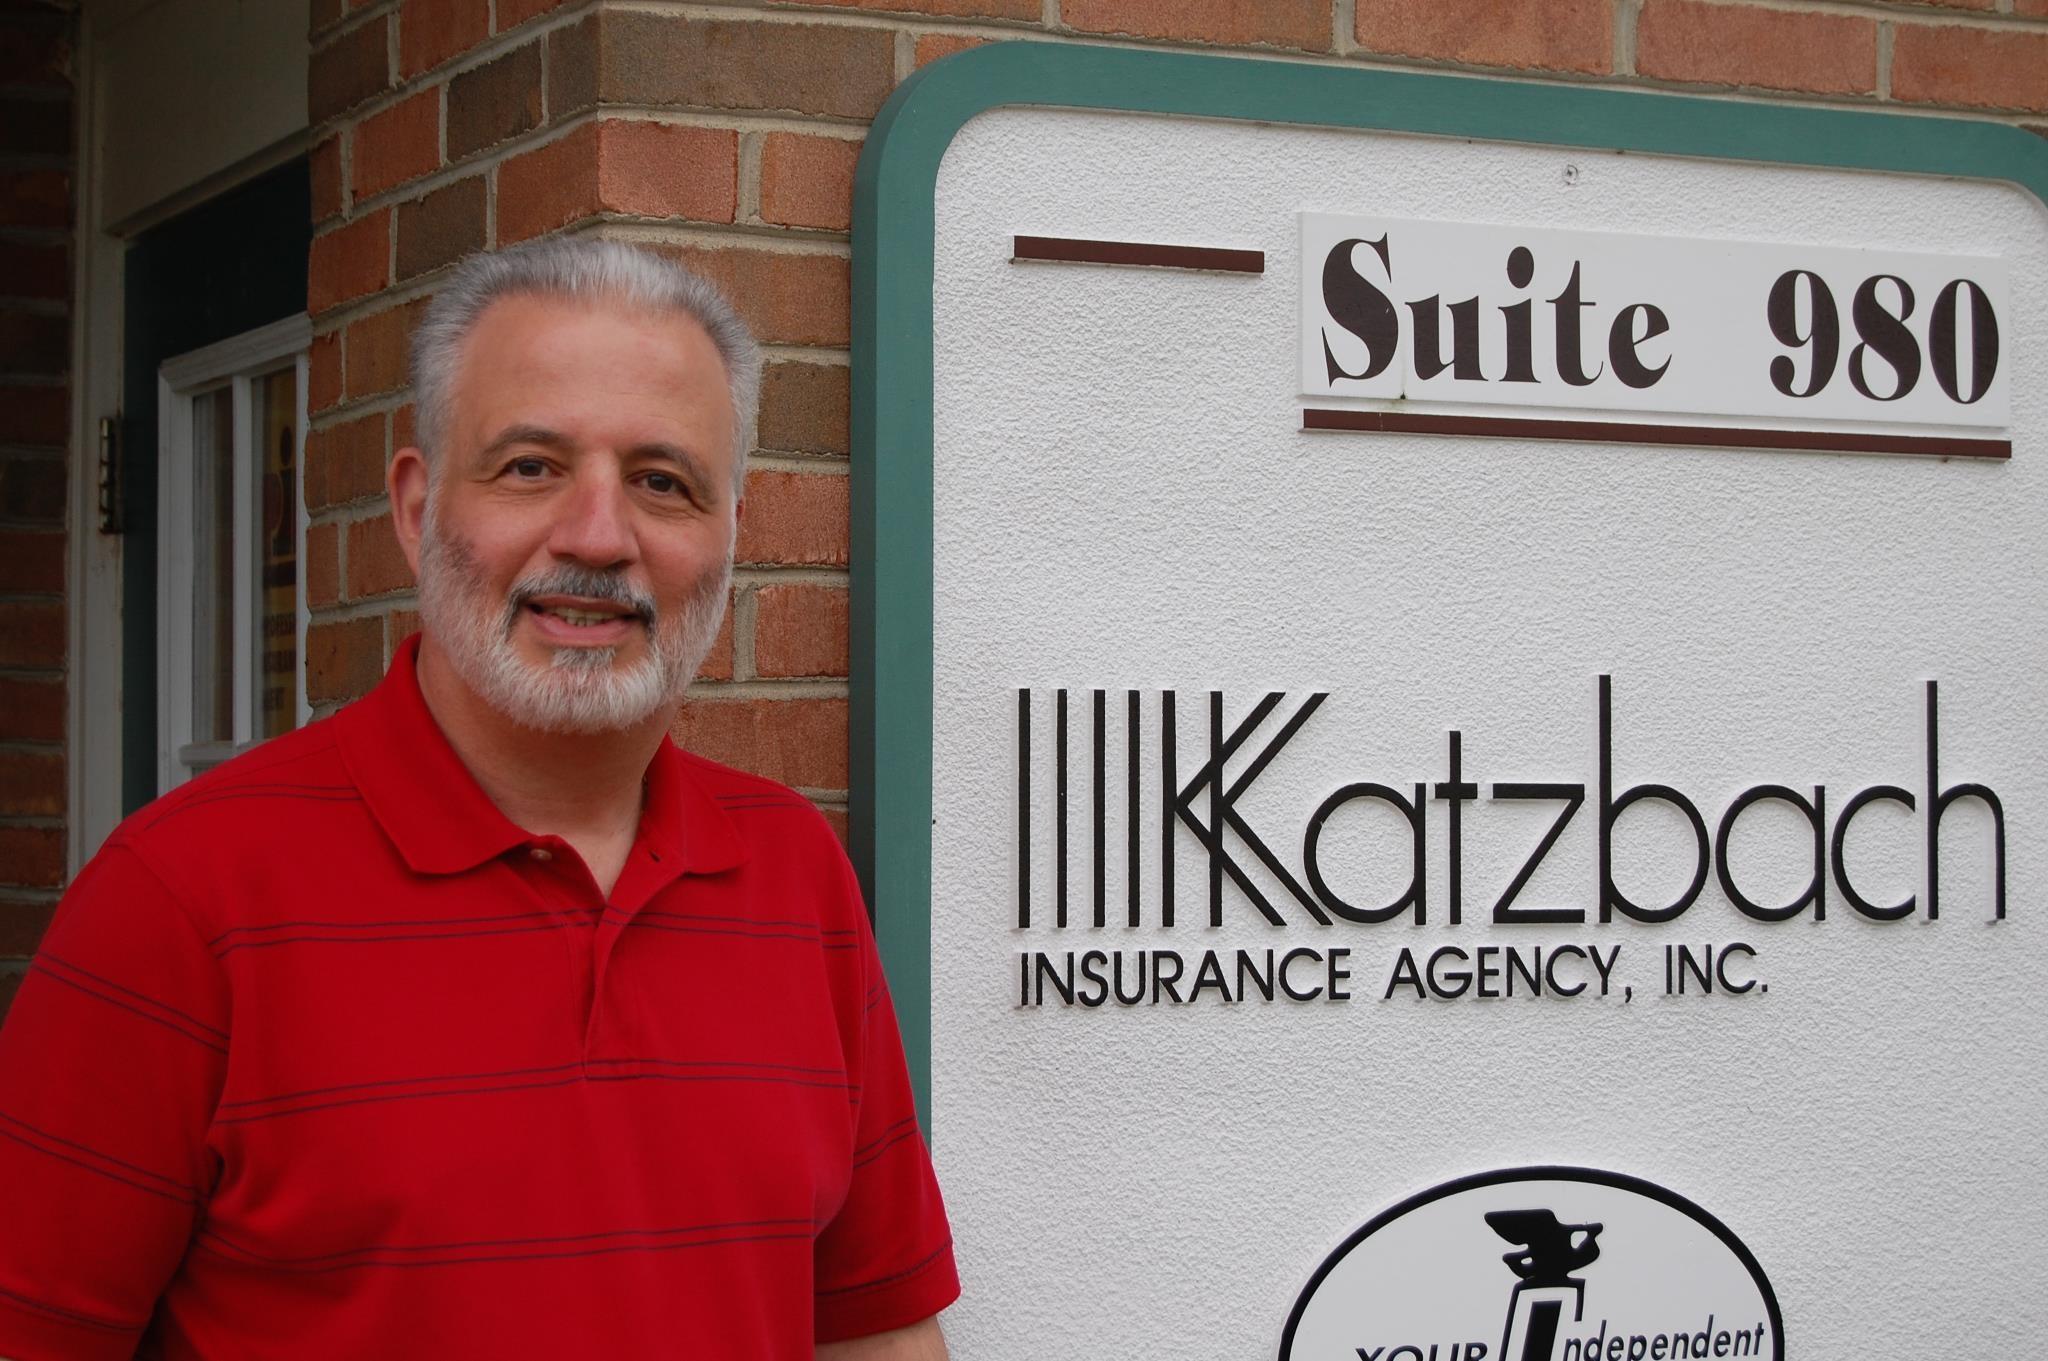 Katzbach Insurance Agency Inc. - Westlake, OH -